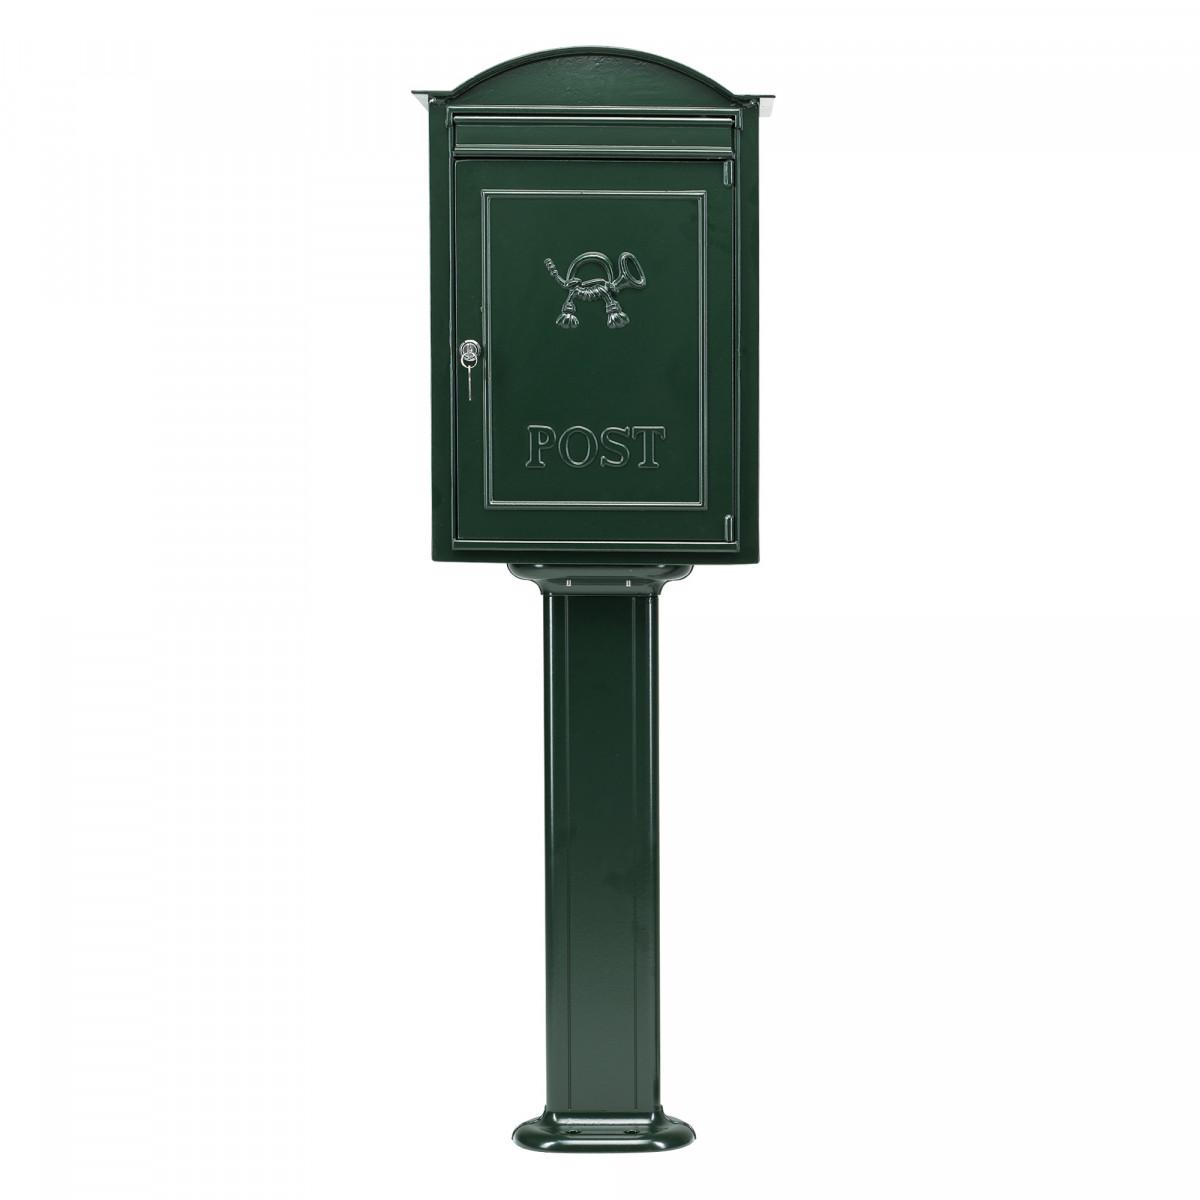 Post box B20 Max